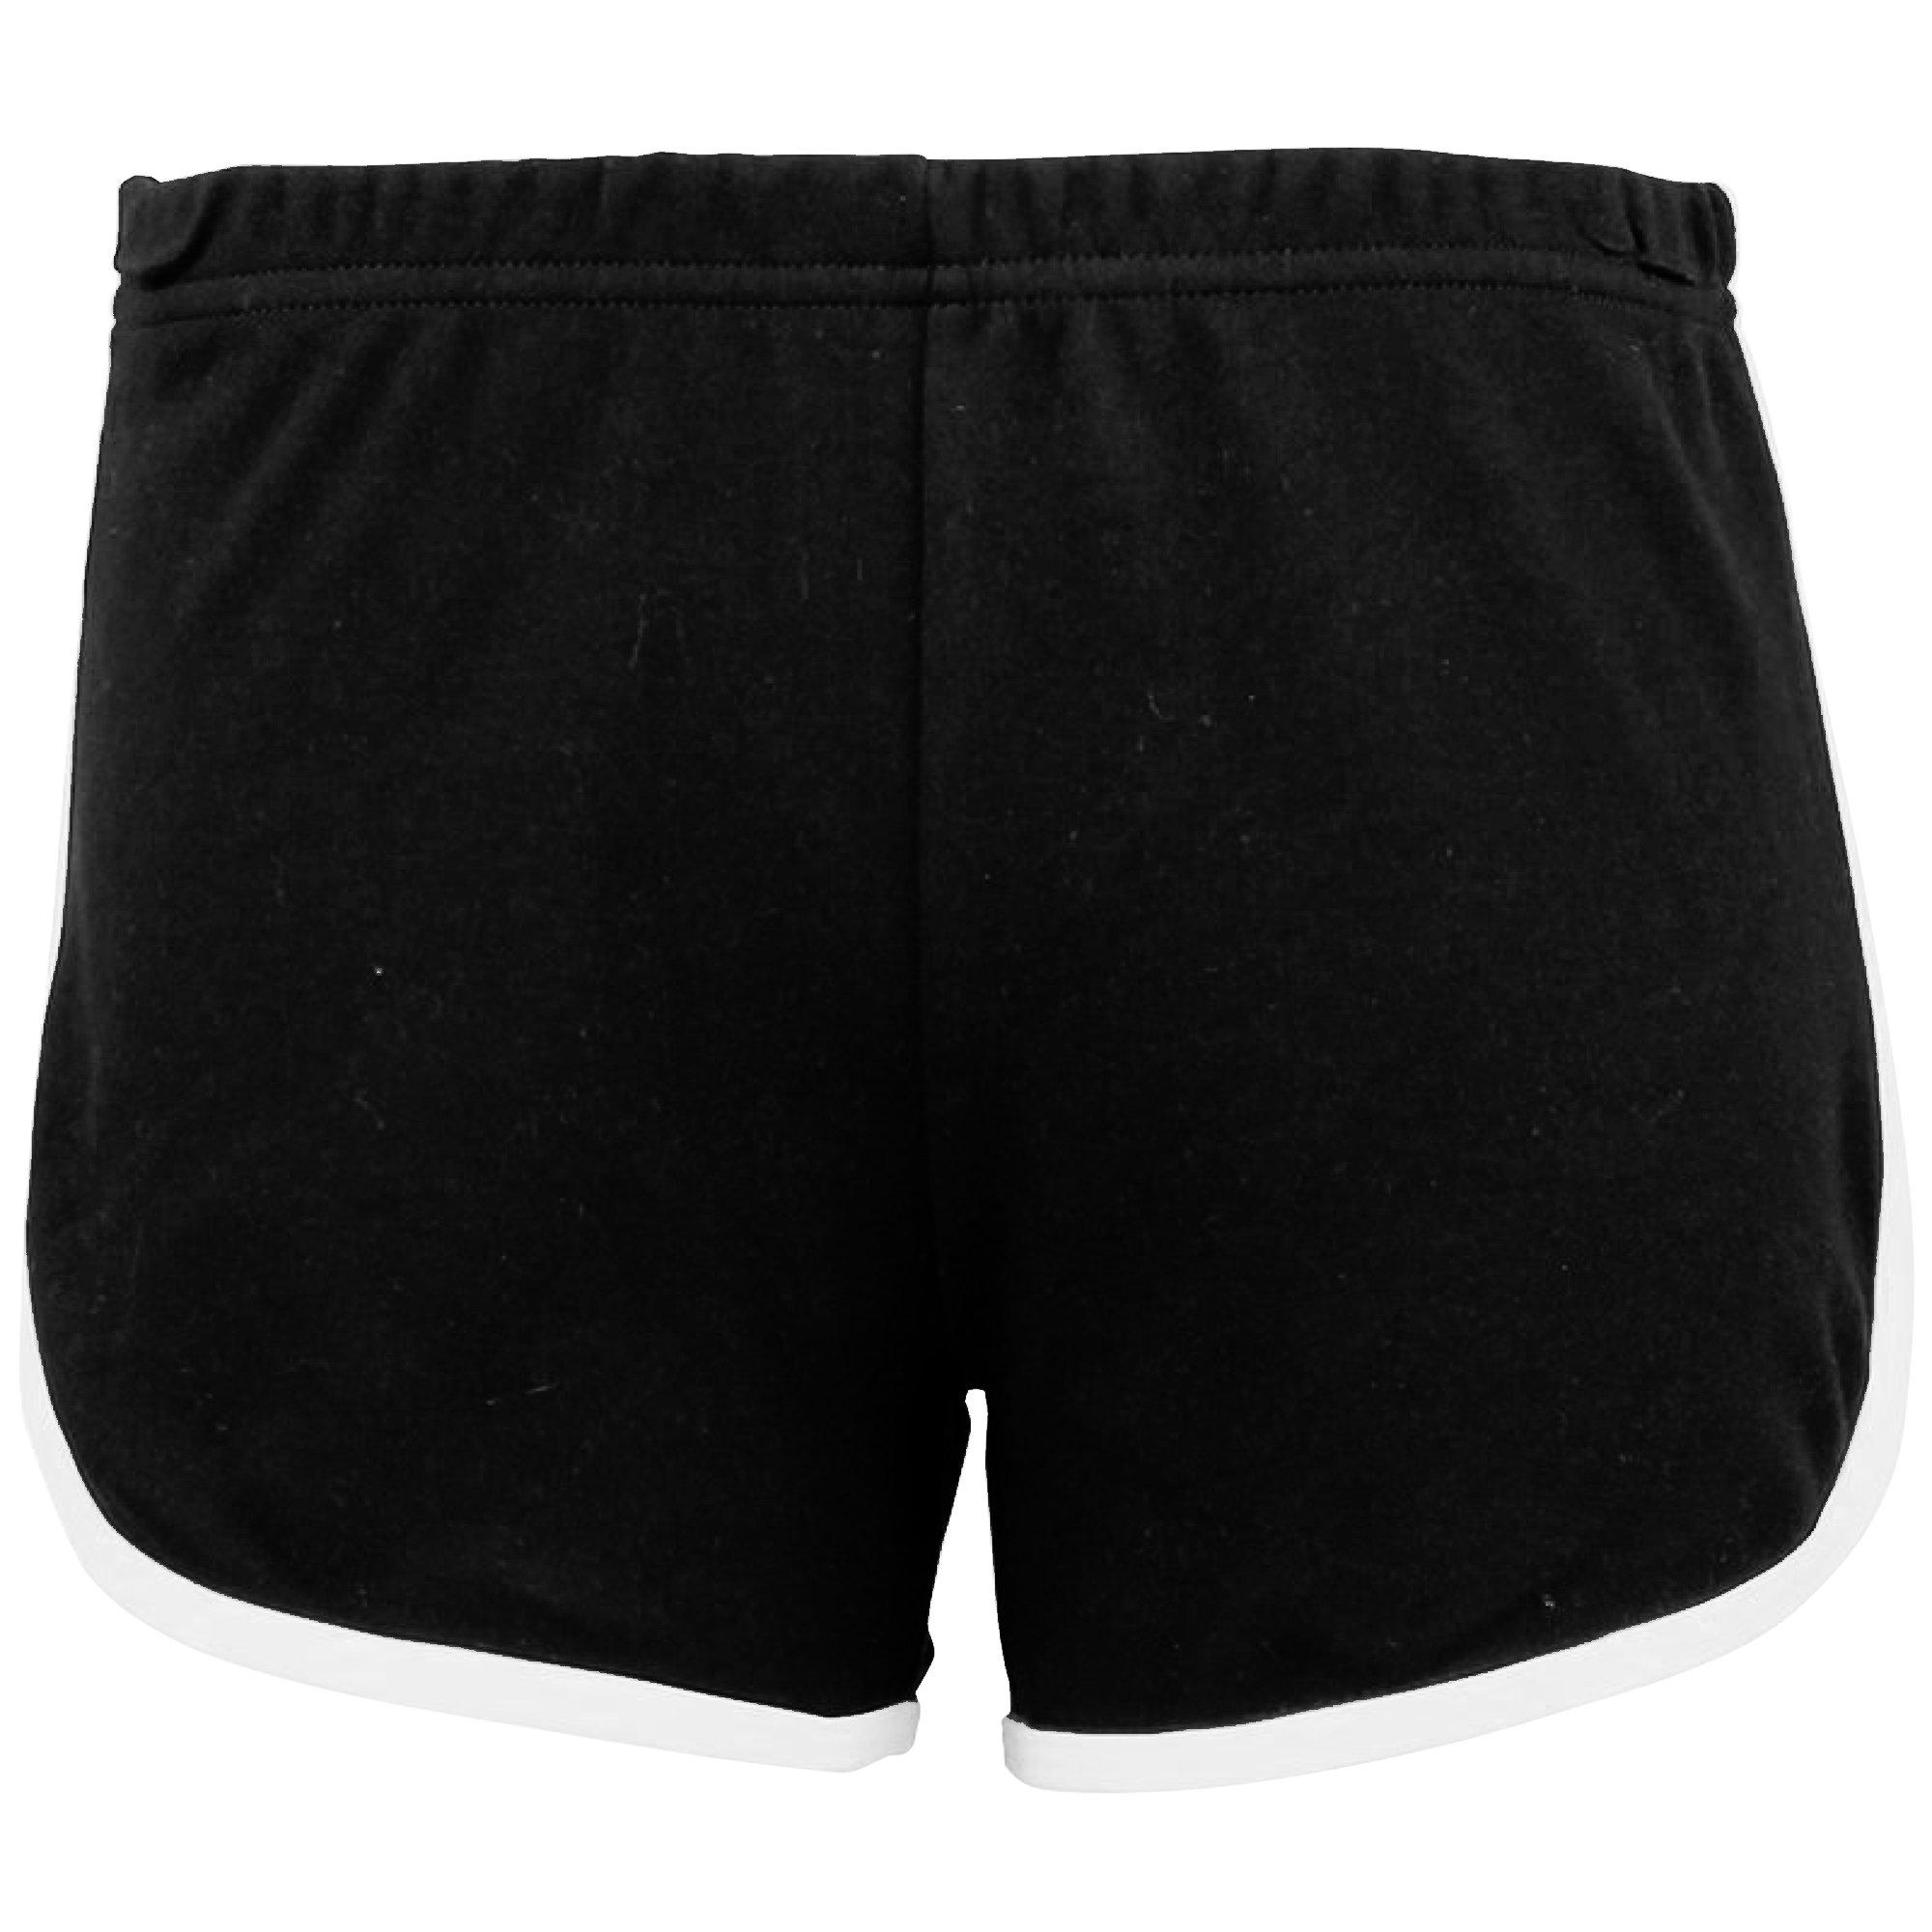 American Apparel Womens/Ladies Cotton Casual/Sports Shorts (M) (Black / White)